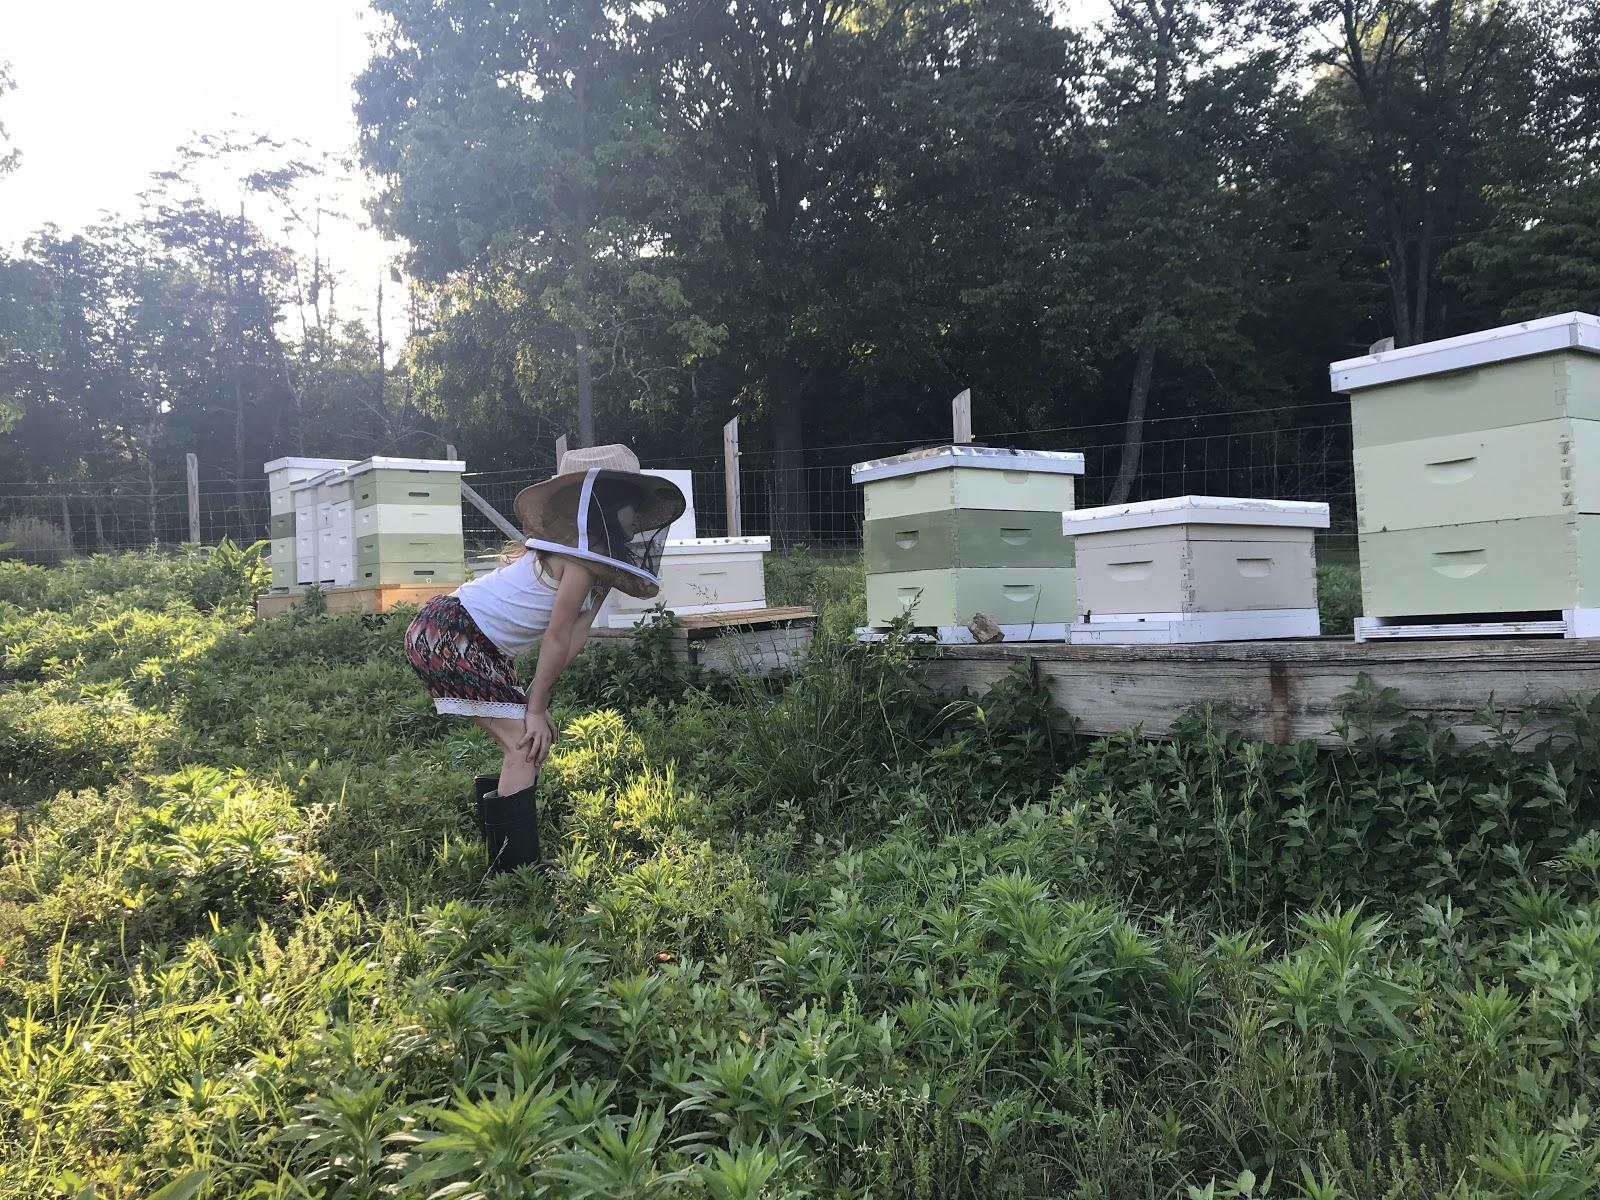 Ella in her Bee Kingdom